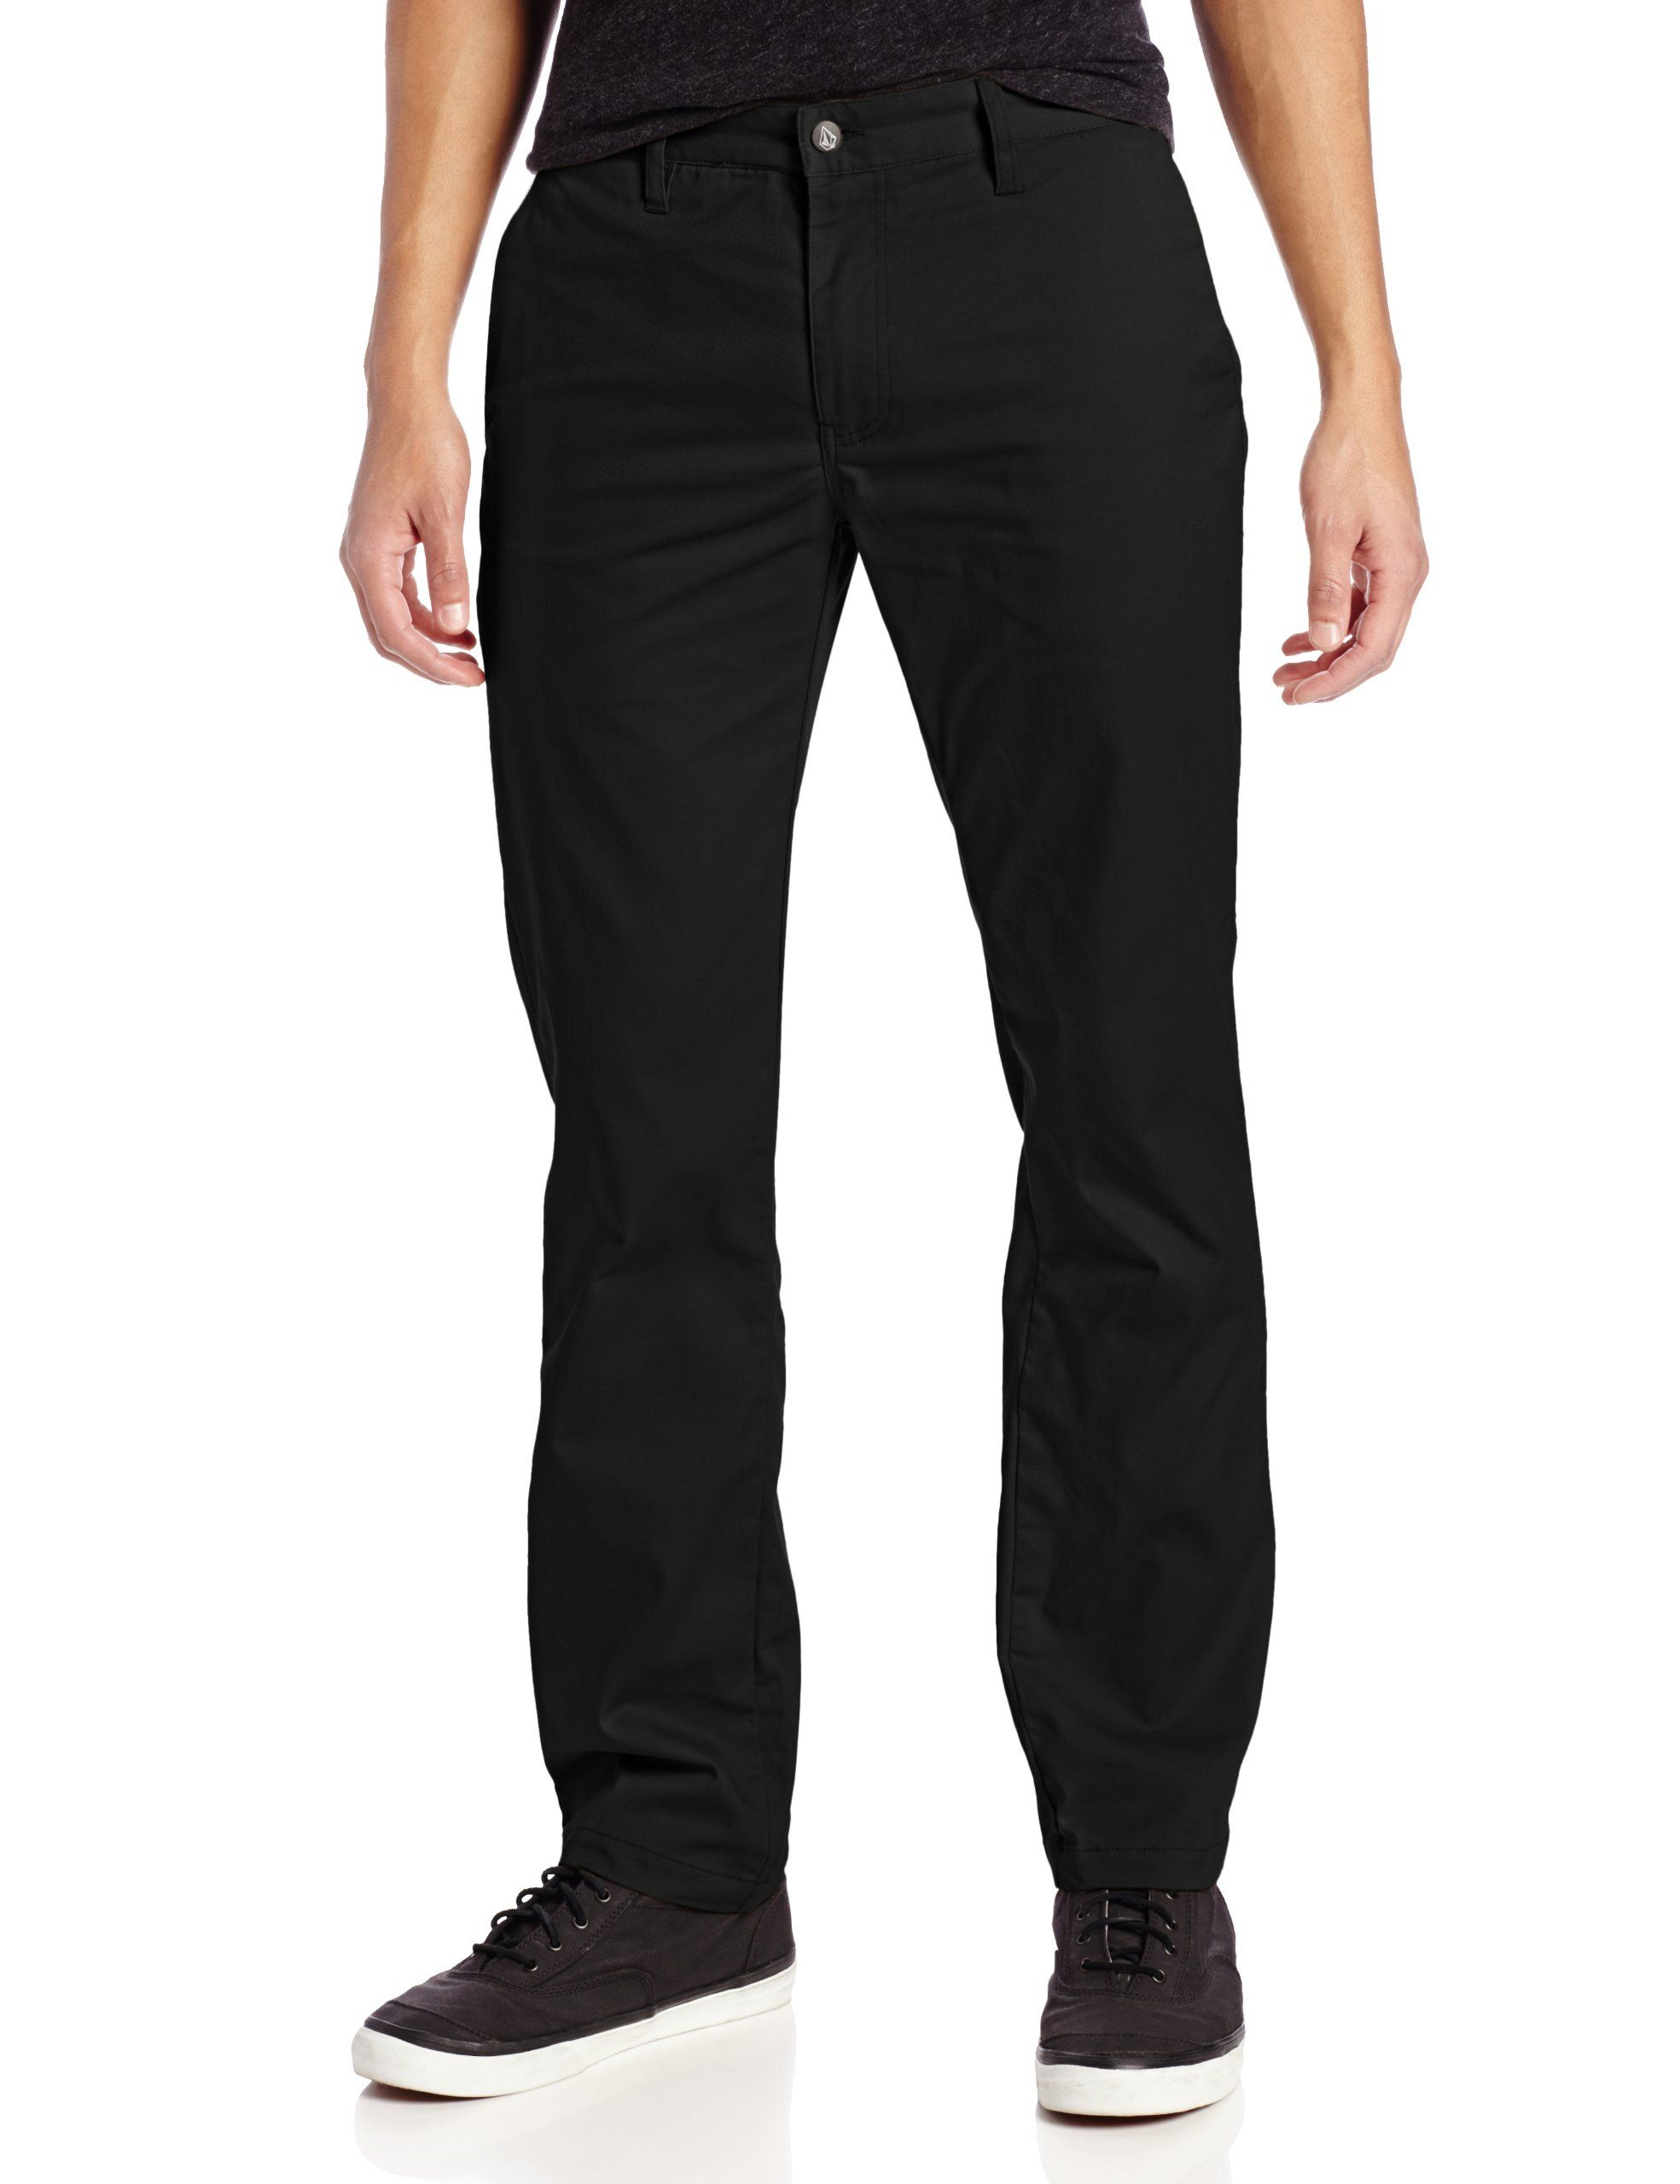 ebfae791fdcf35 Volcom Mens Frickin Modern Stretch Chino Pant, Black, 28: Amazon.ca:  Clothing & Accessories